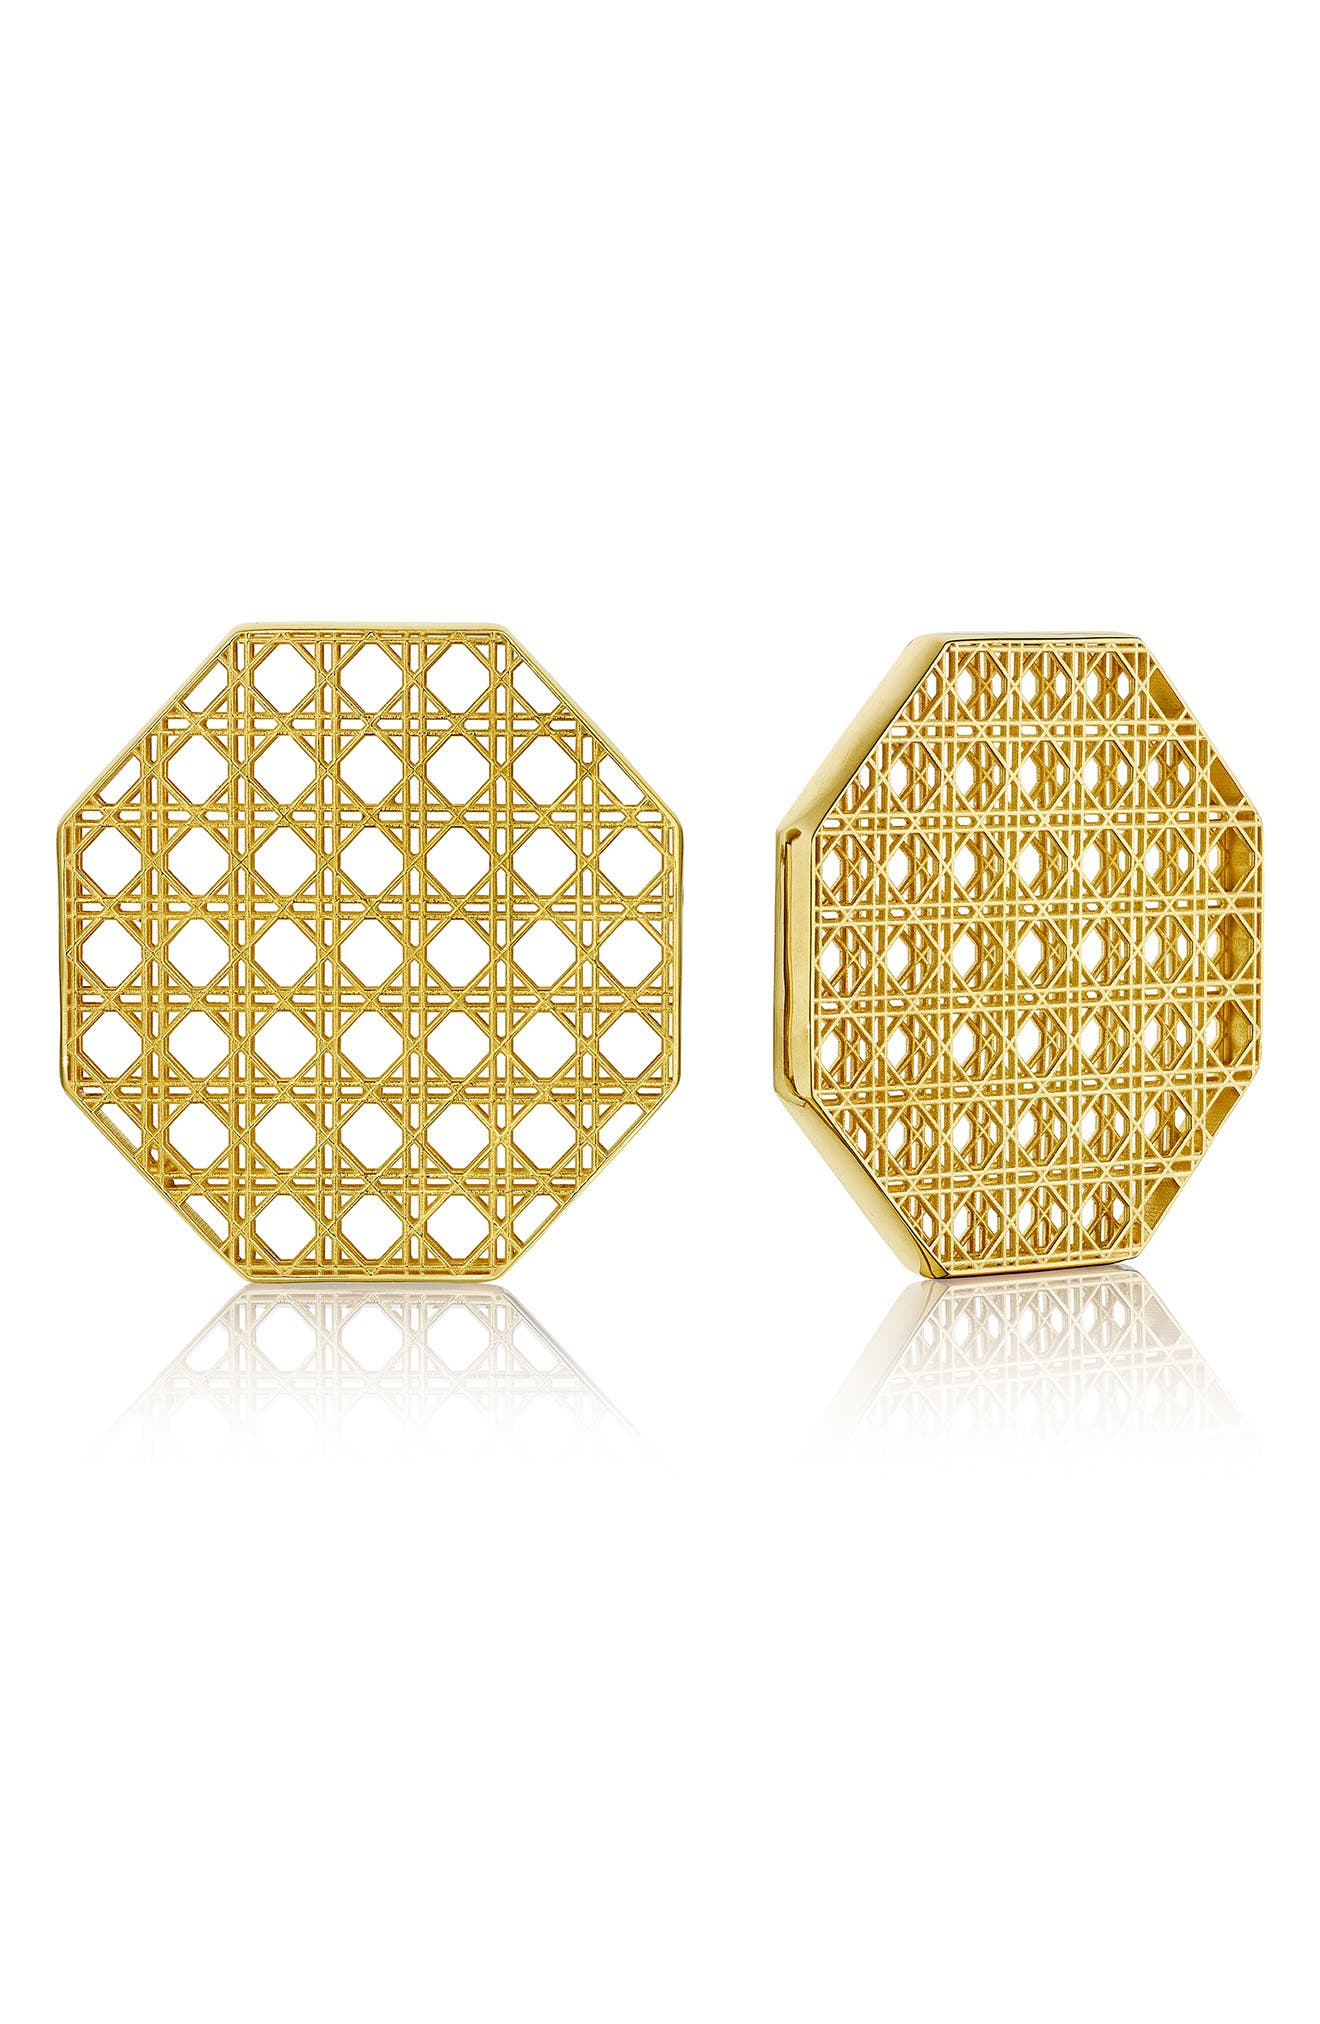 Cane Octagonal Stud Earrings